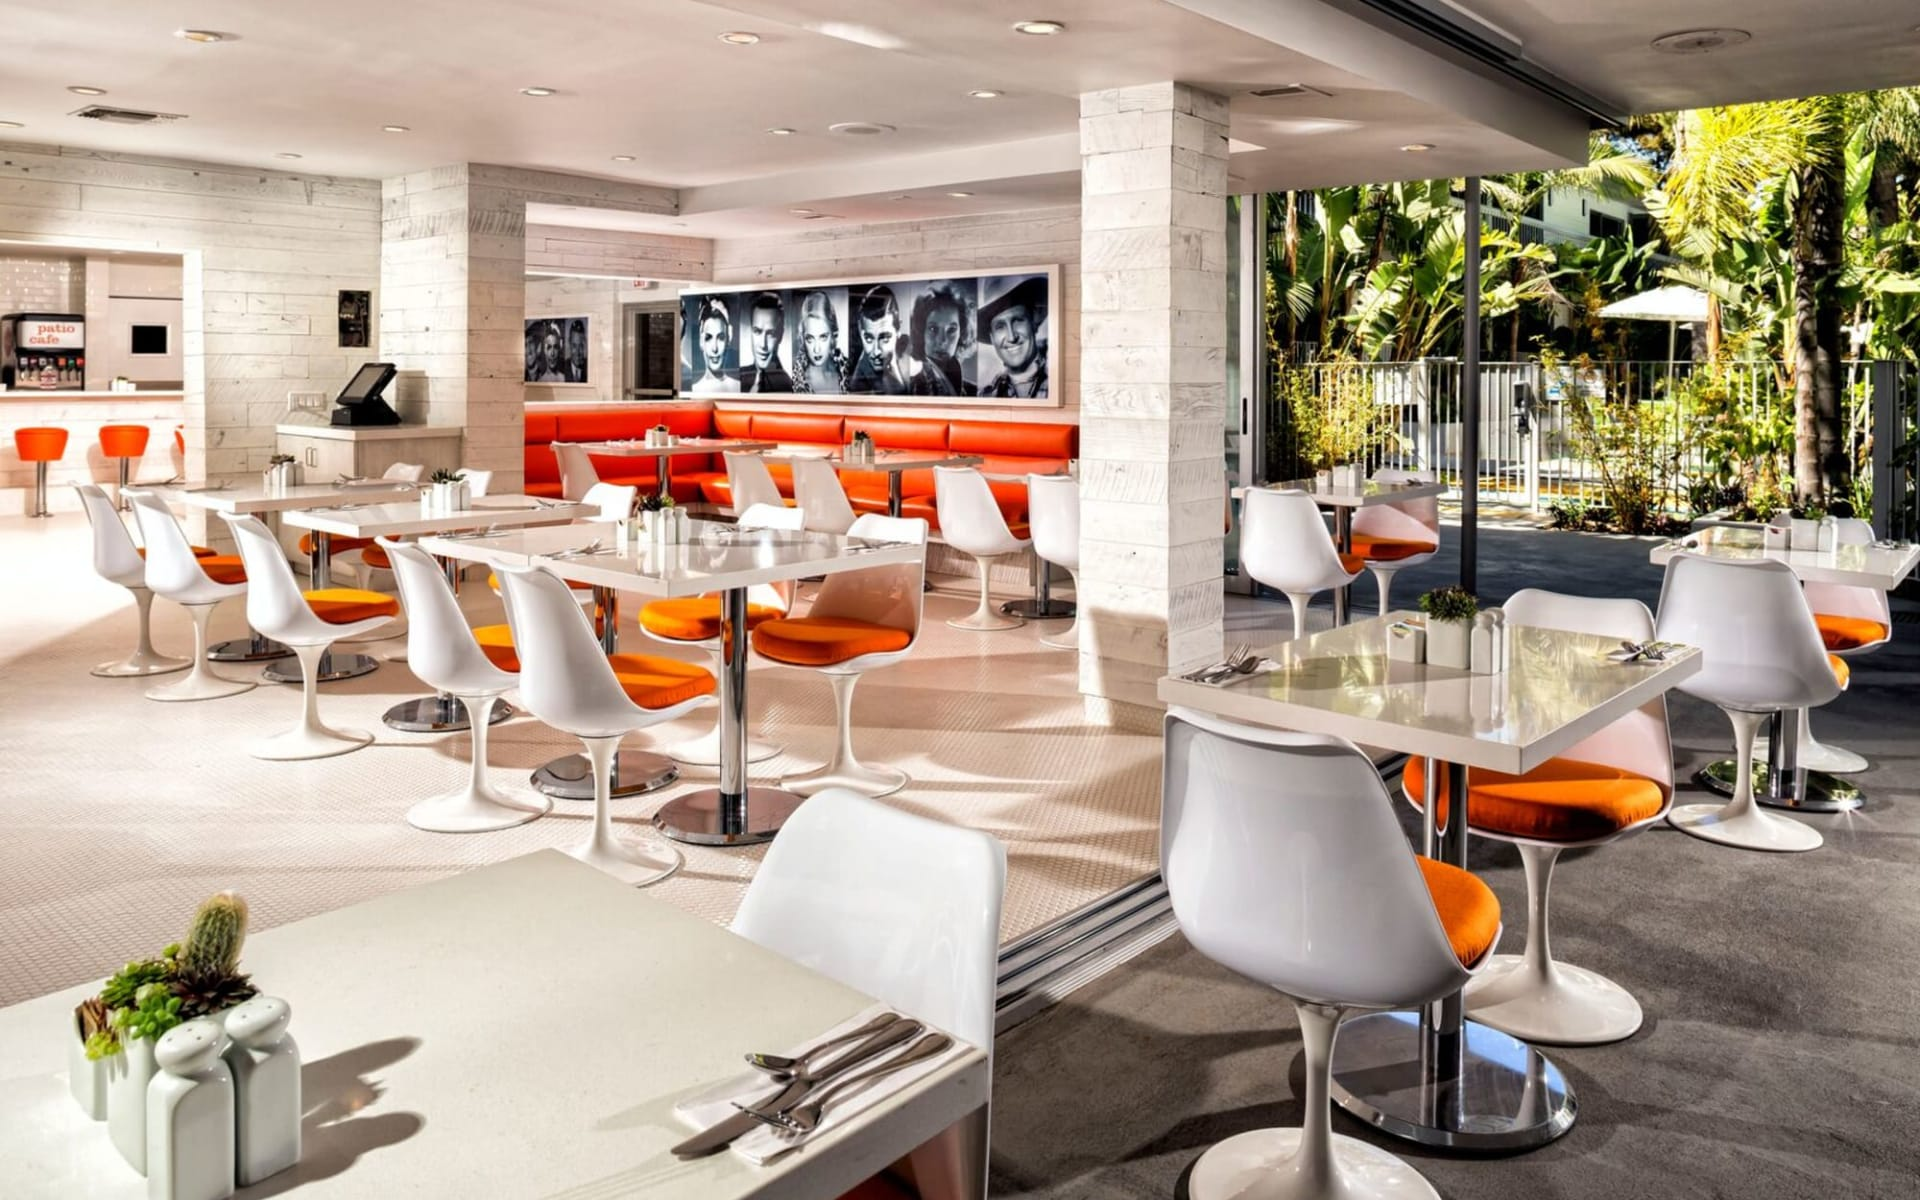 Sportsmen's Lodge Hotel in Hollywood-Studio City:  Sportsmen's Lodge - Patio Cafe